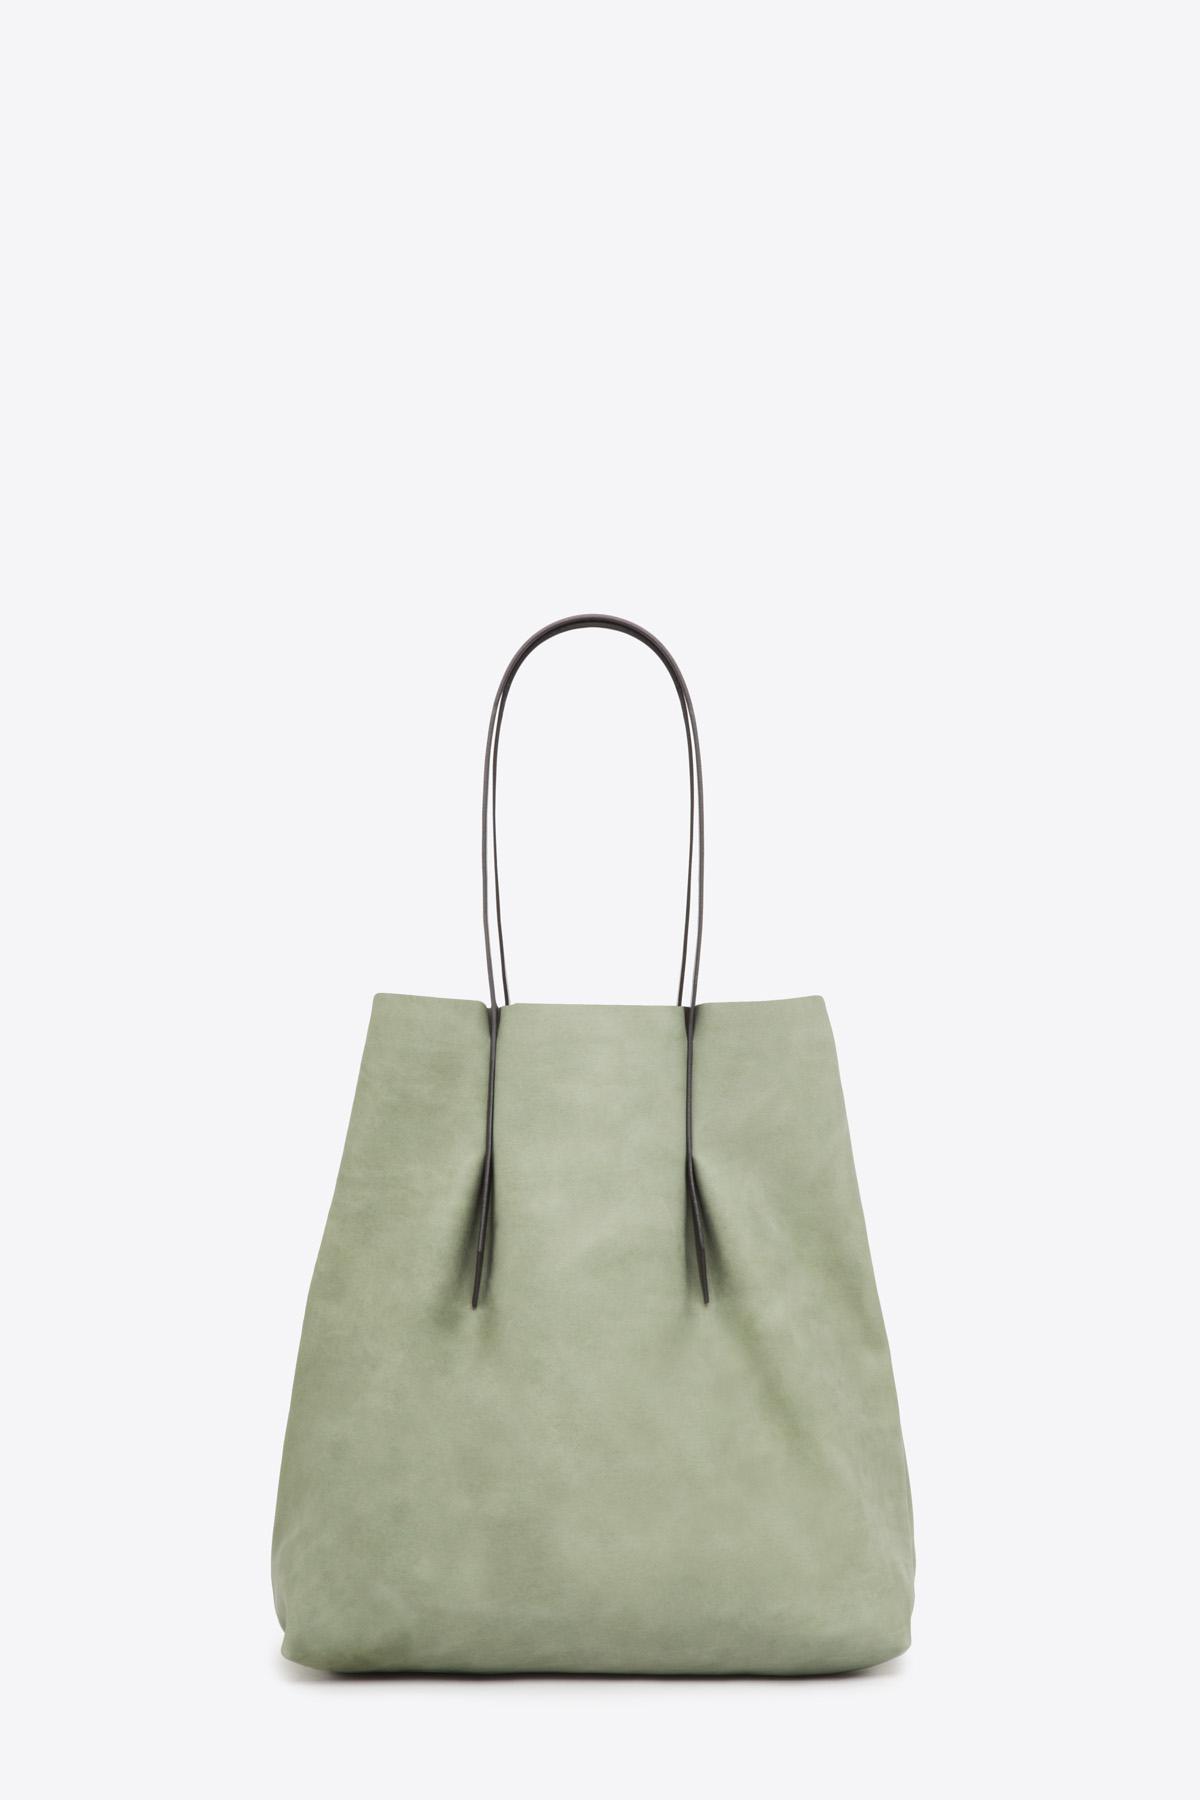 dclr006-shoppingbag-a9-jadegreen-back